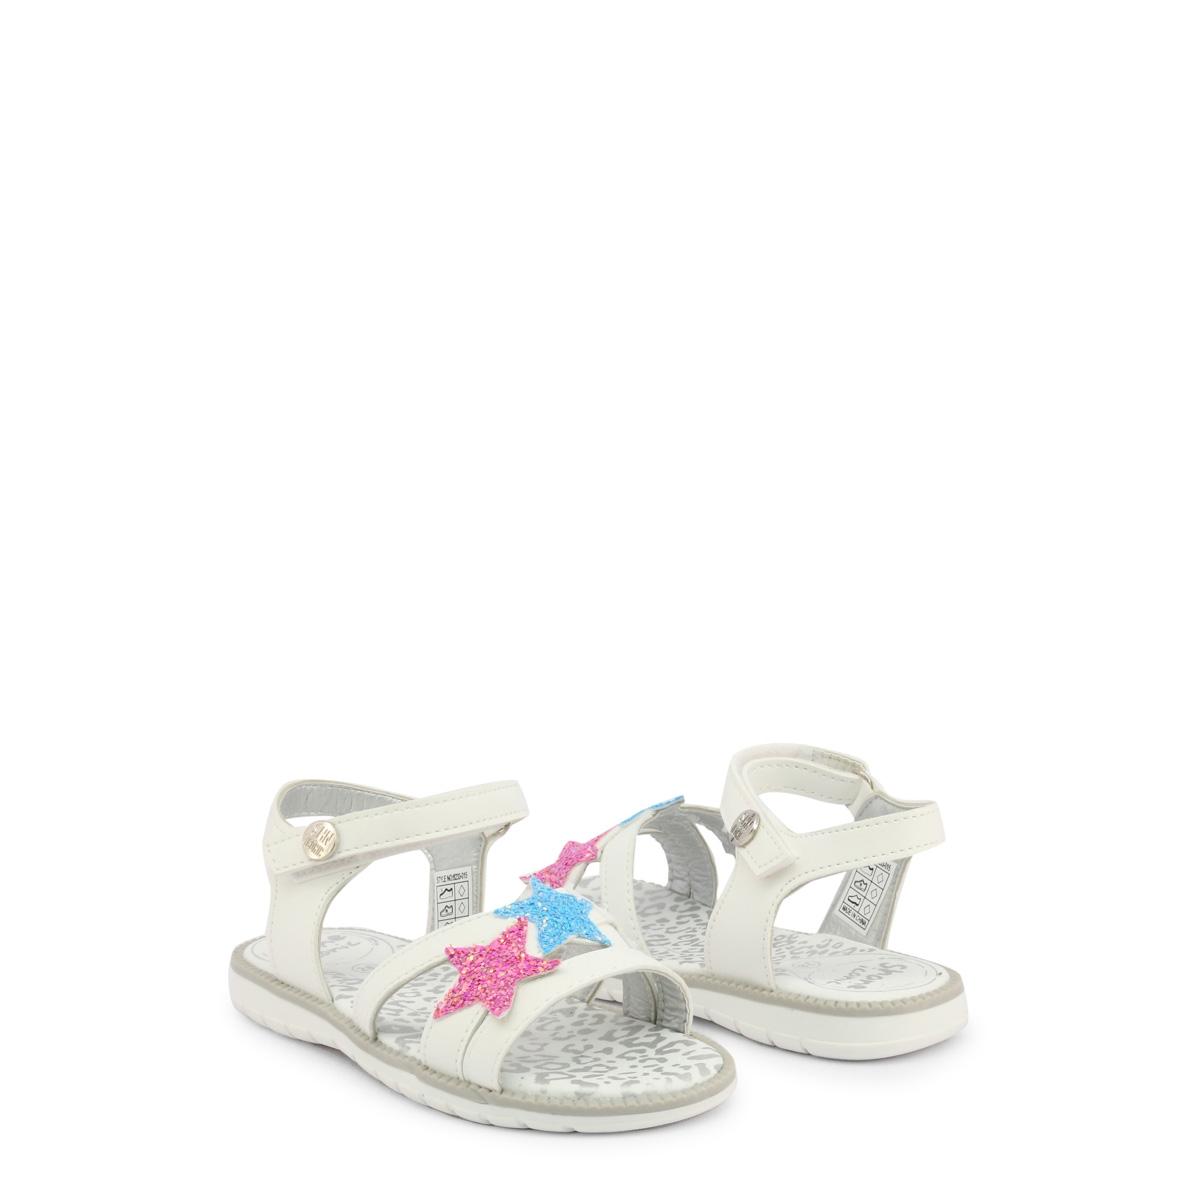 Sandale Shone 8233-015 Alb